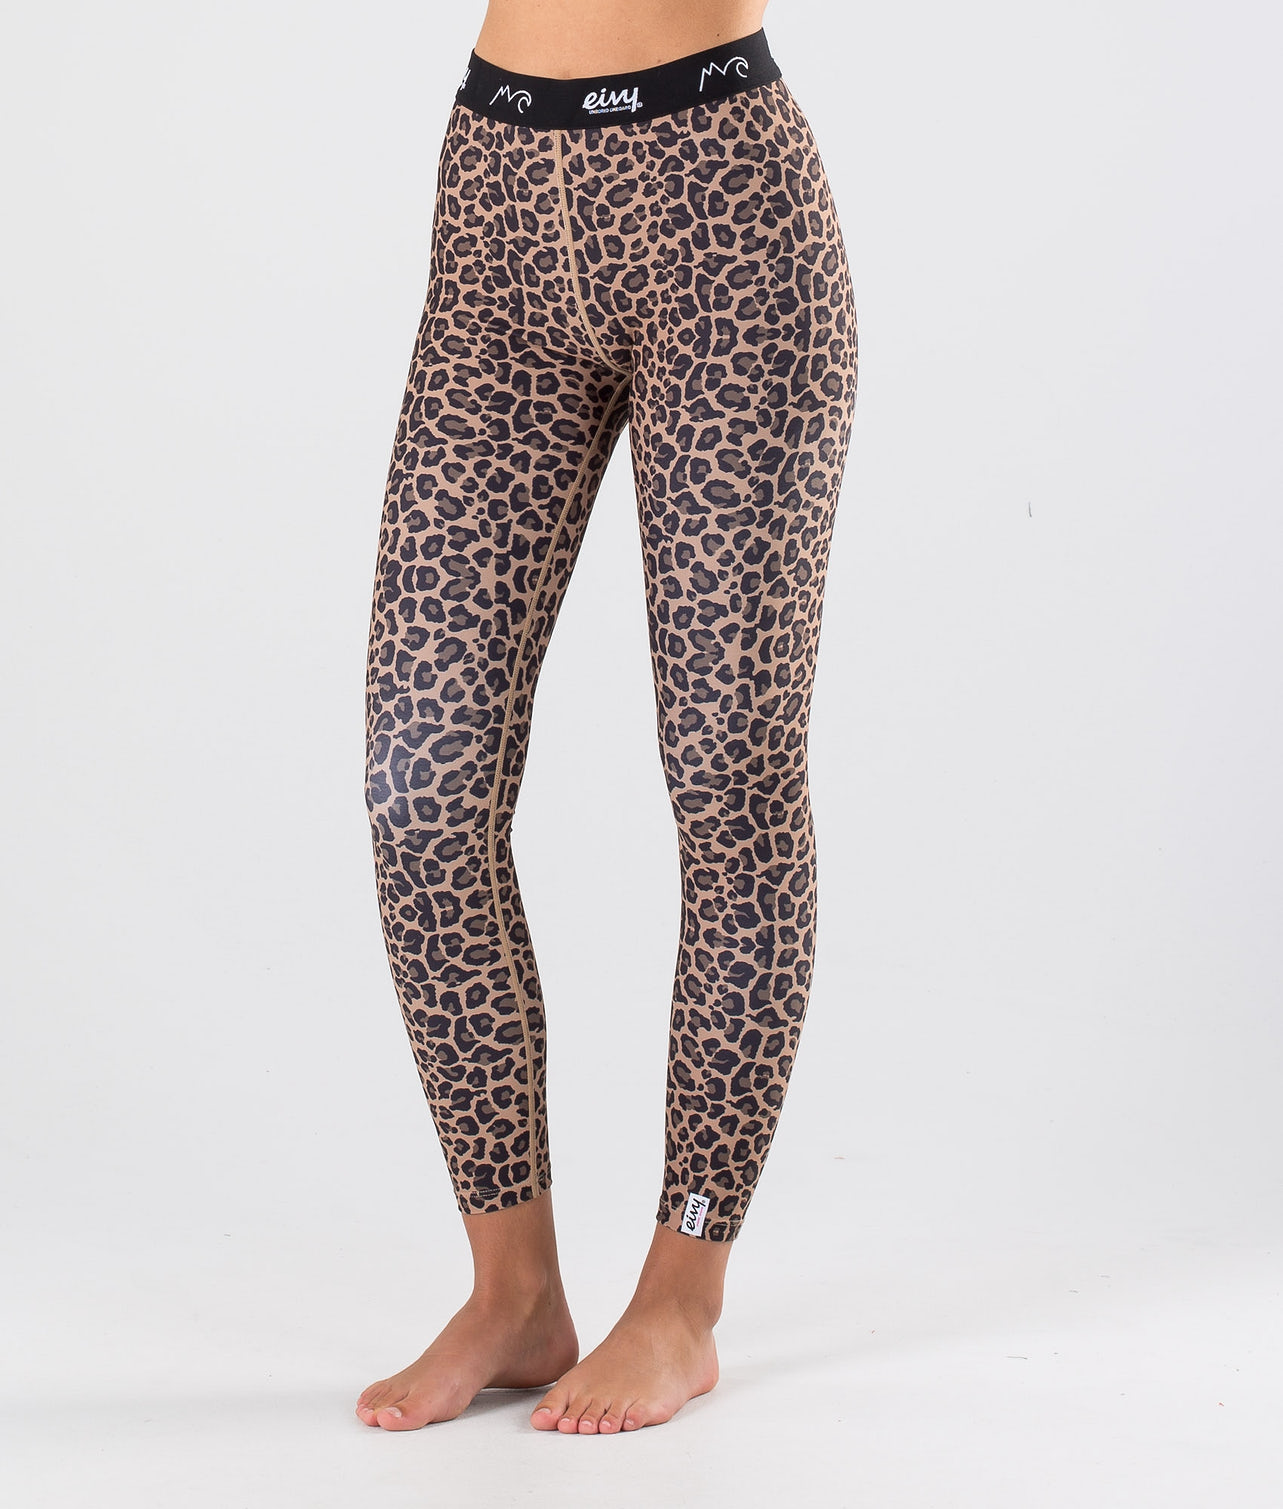 Eivy Iceold Tights Superundertøy bukse Leopard